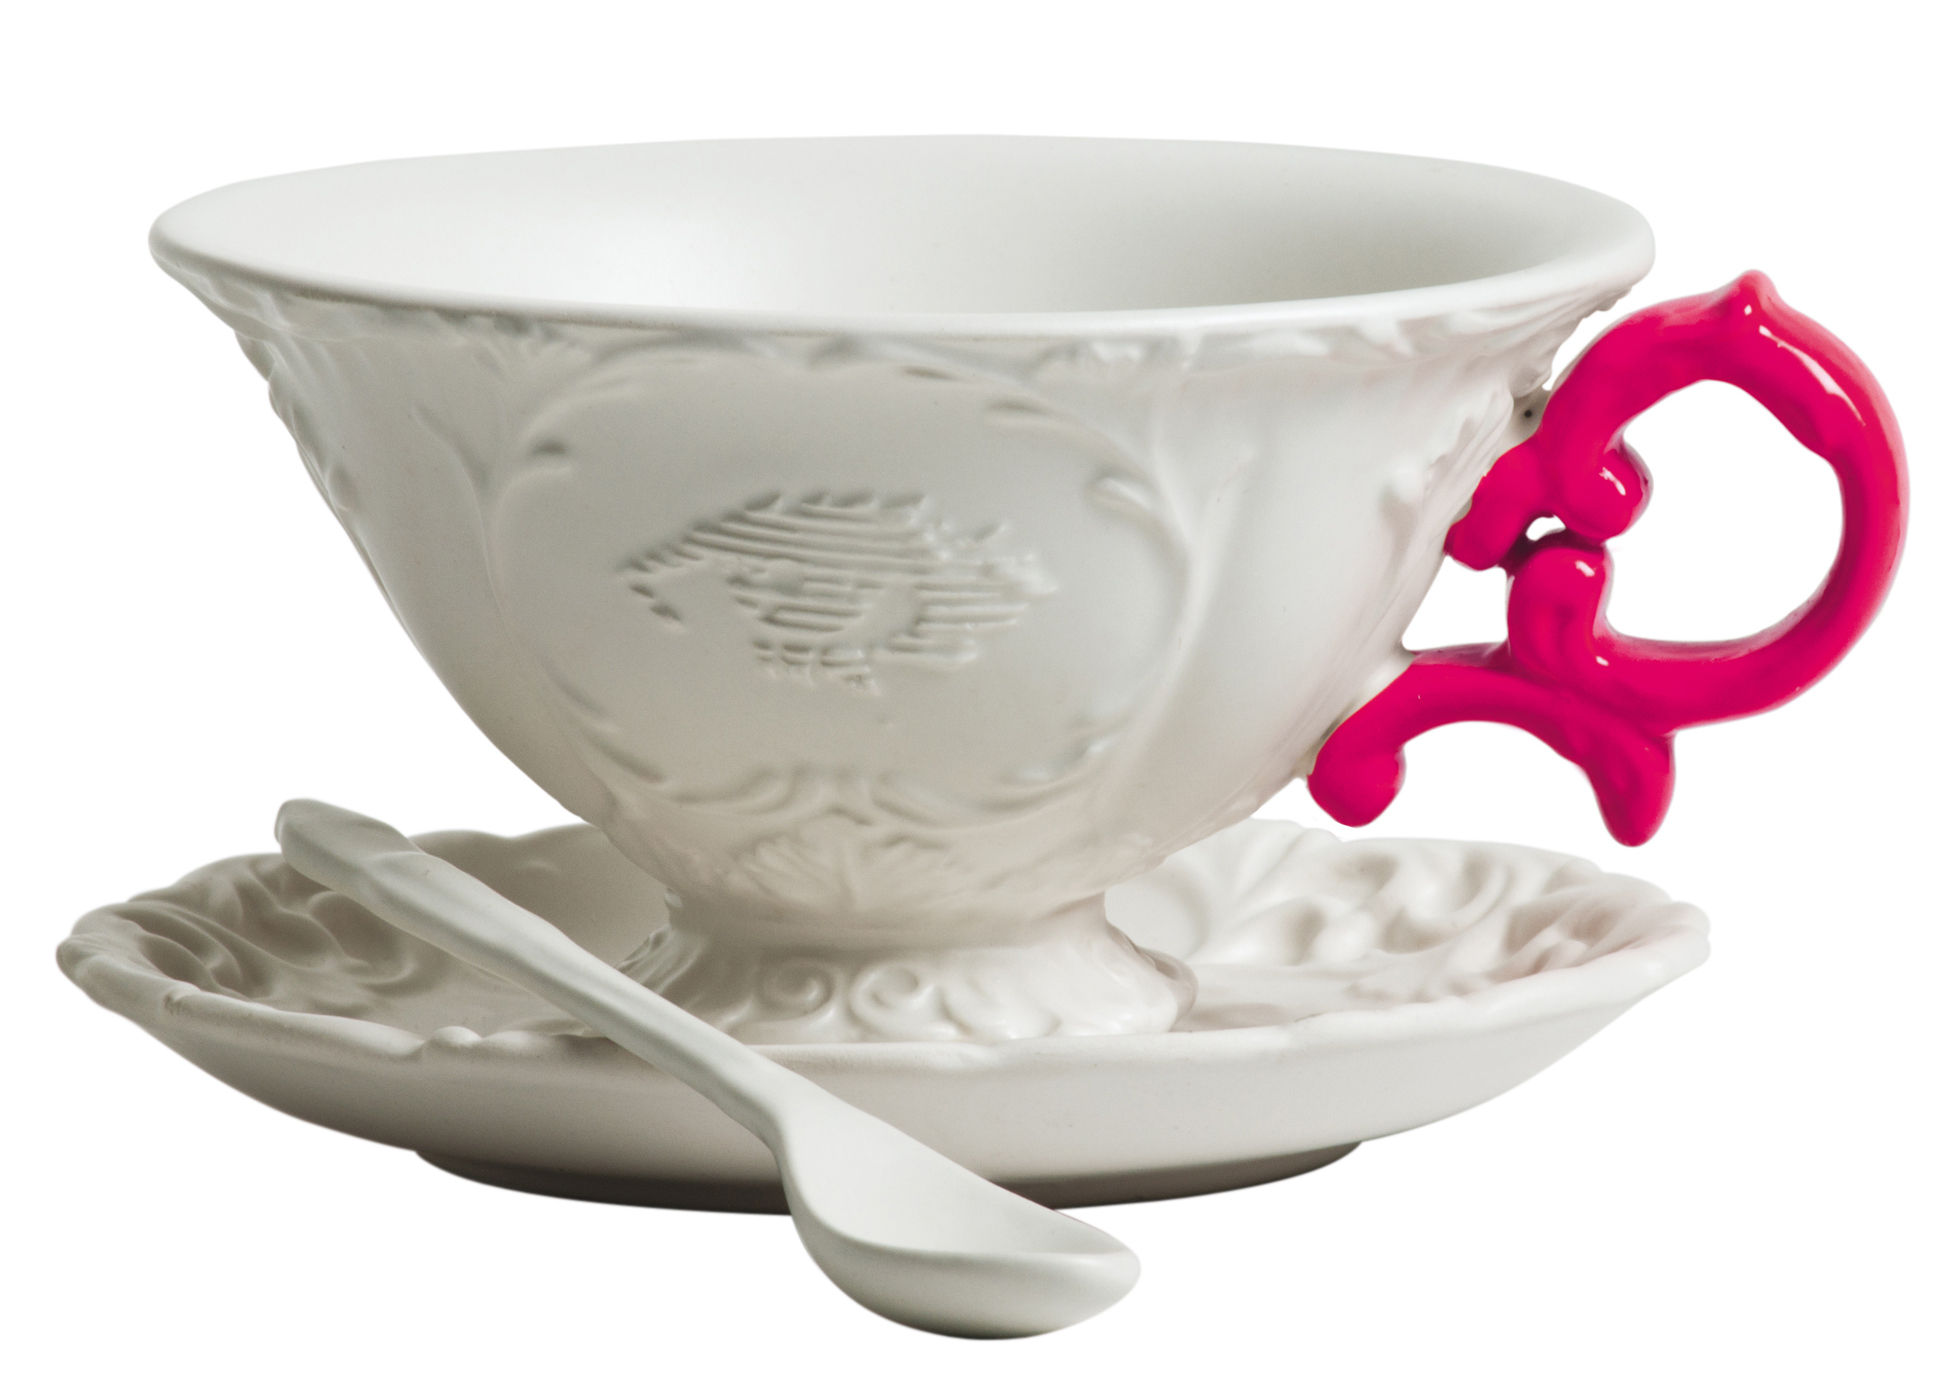 Arts de la table - Tasses et mugs - Tasse à thé I-Tea / Set tasse + soucoupe + cuillère - Seletti - Blanc / Anse fuchsia - Porcelaine